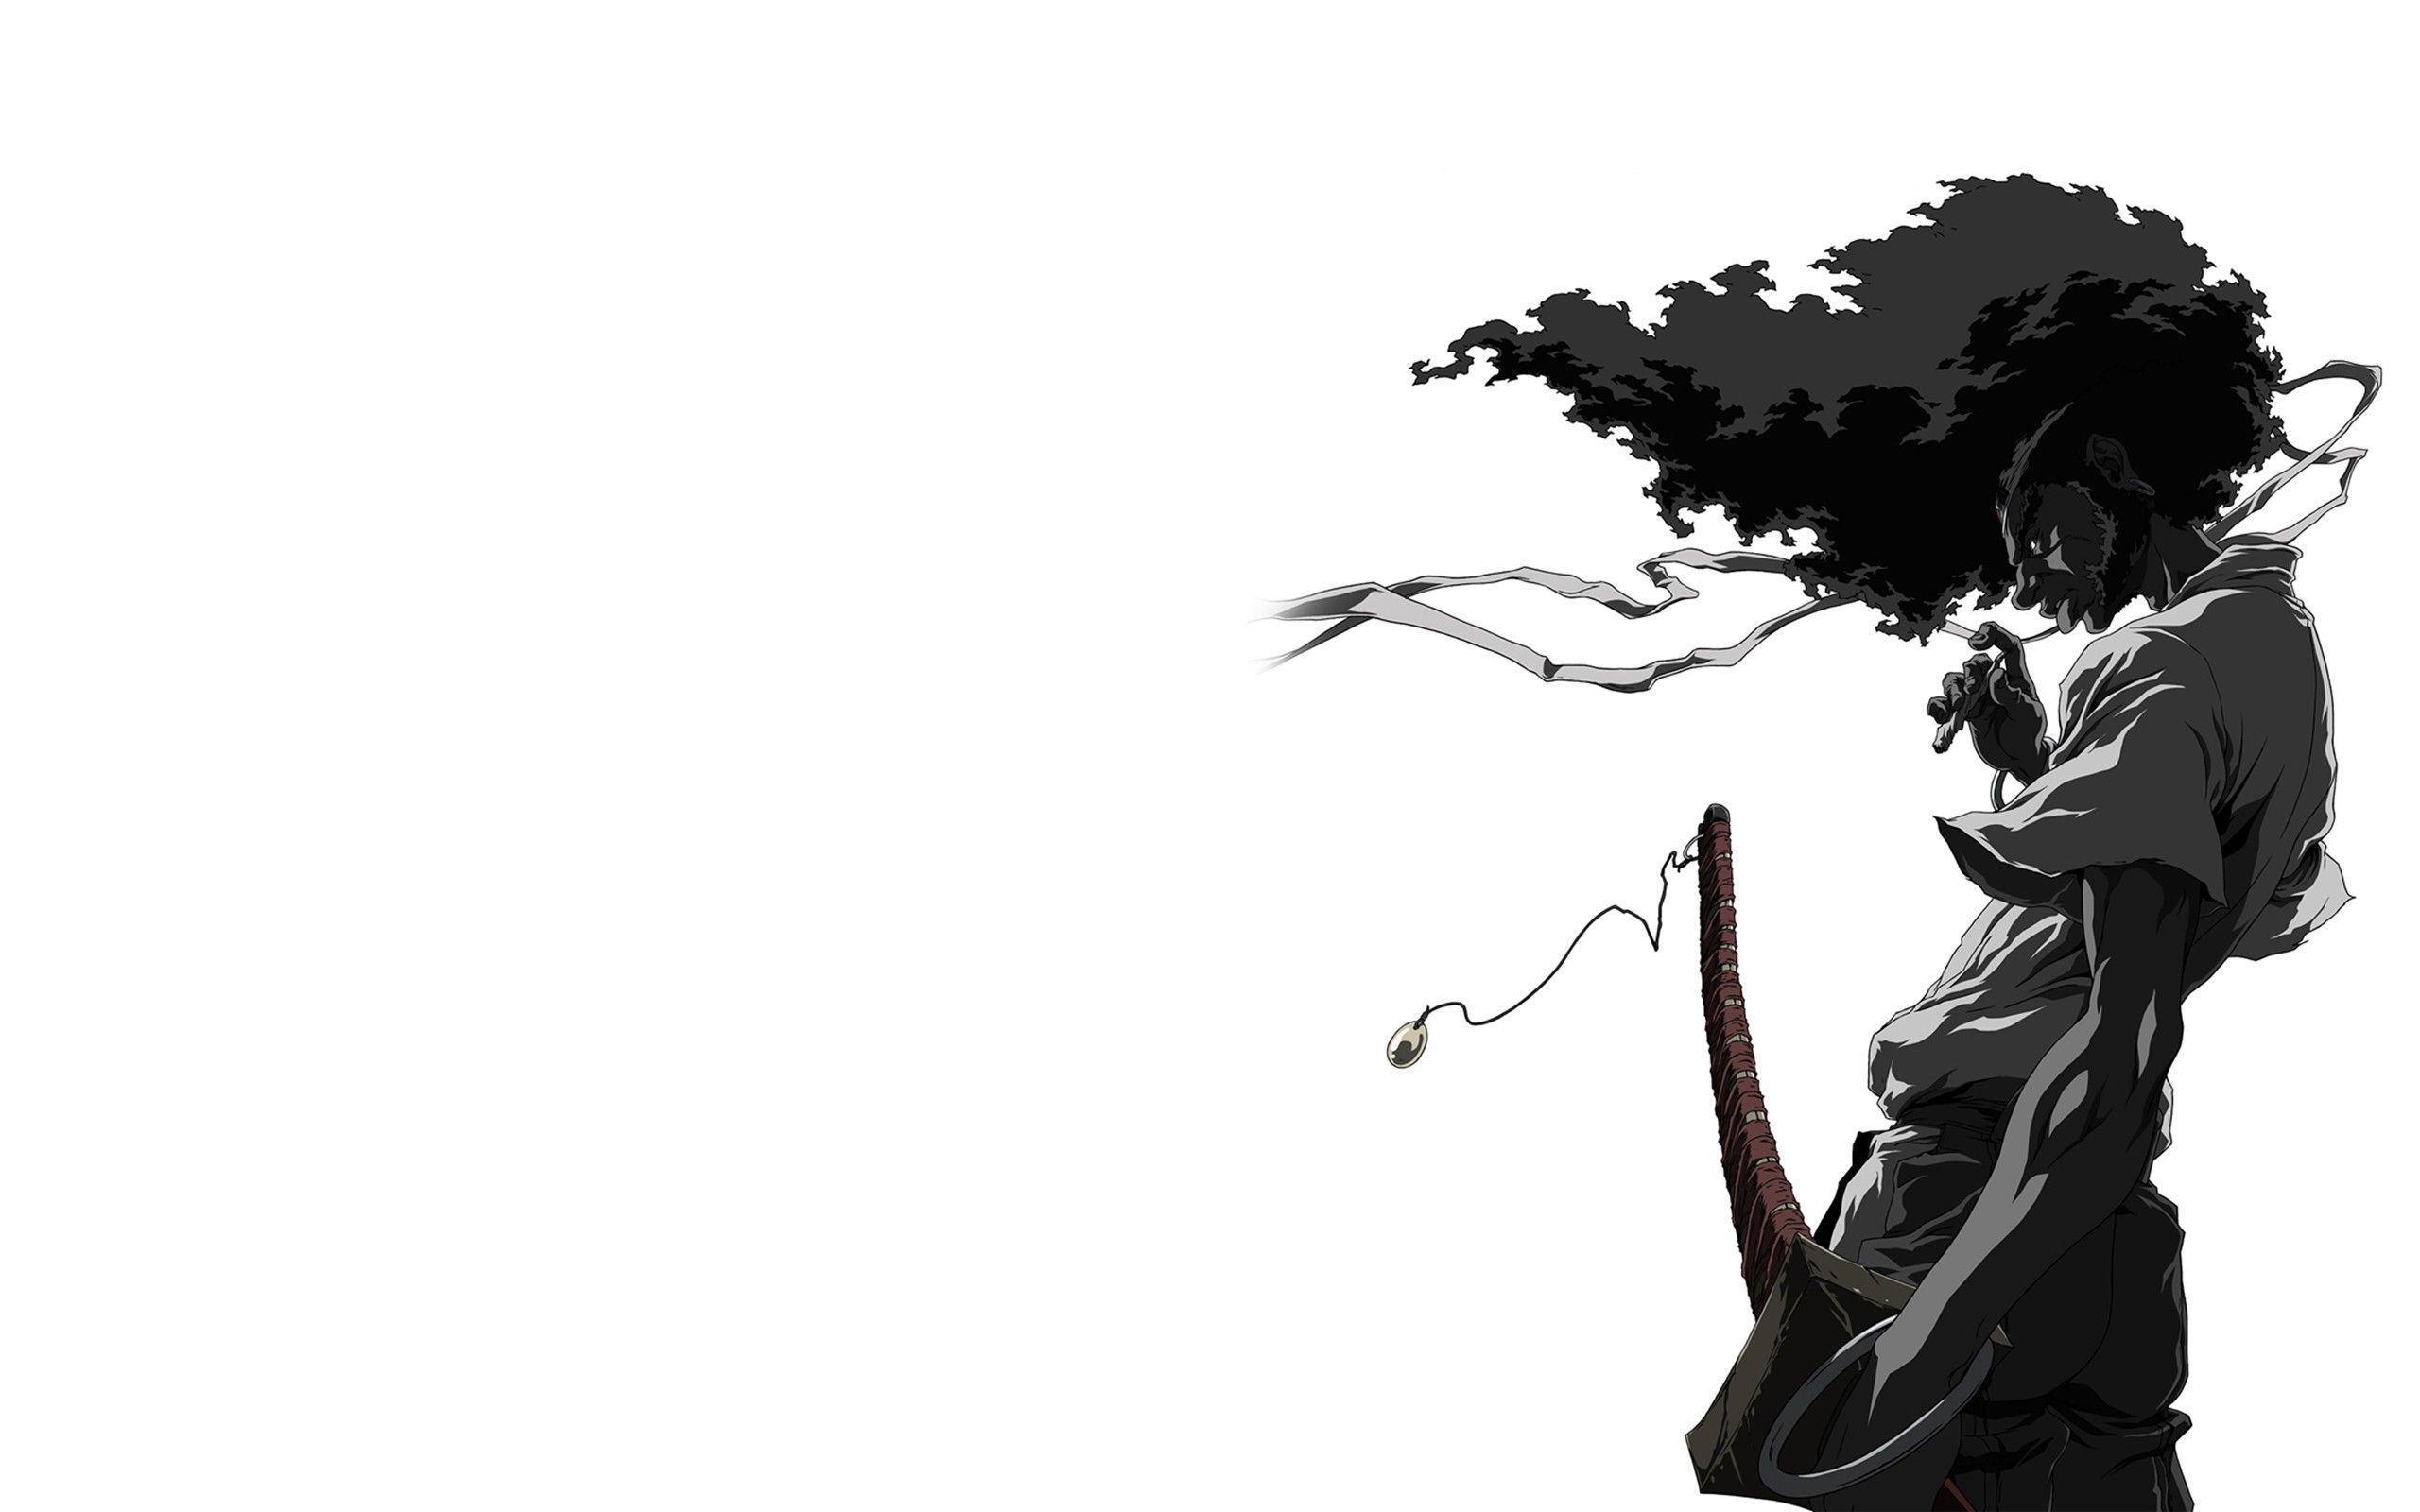 Afro Samurai Wallpapers Free Wide HD Wallpapers Desktop Background